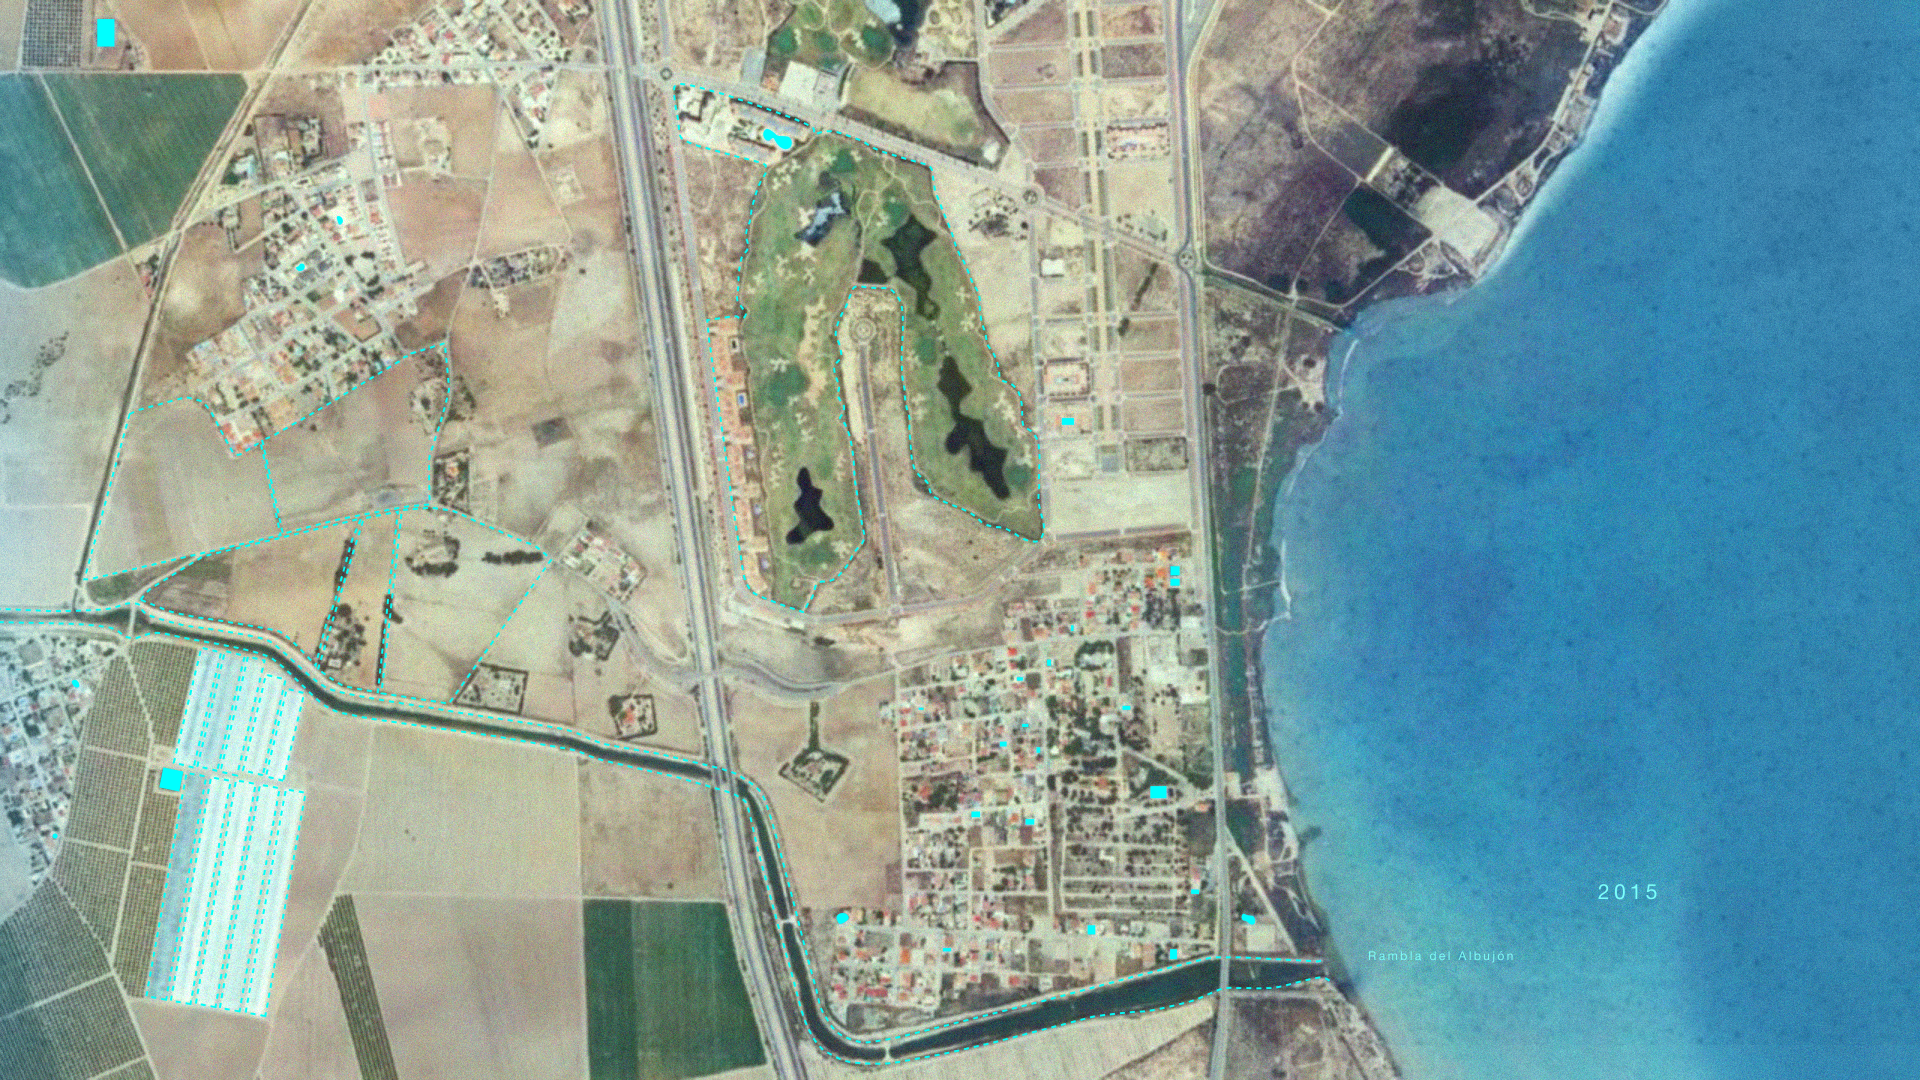 The Mar Menor in 2015.